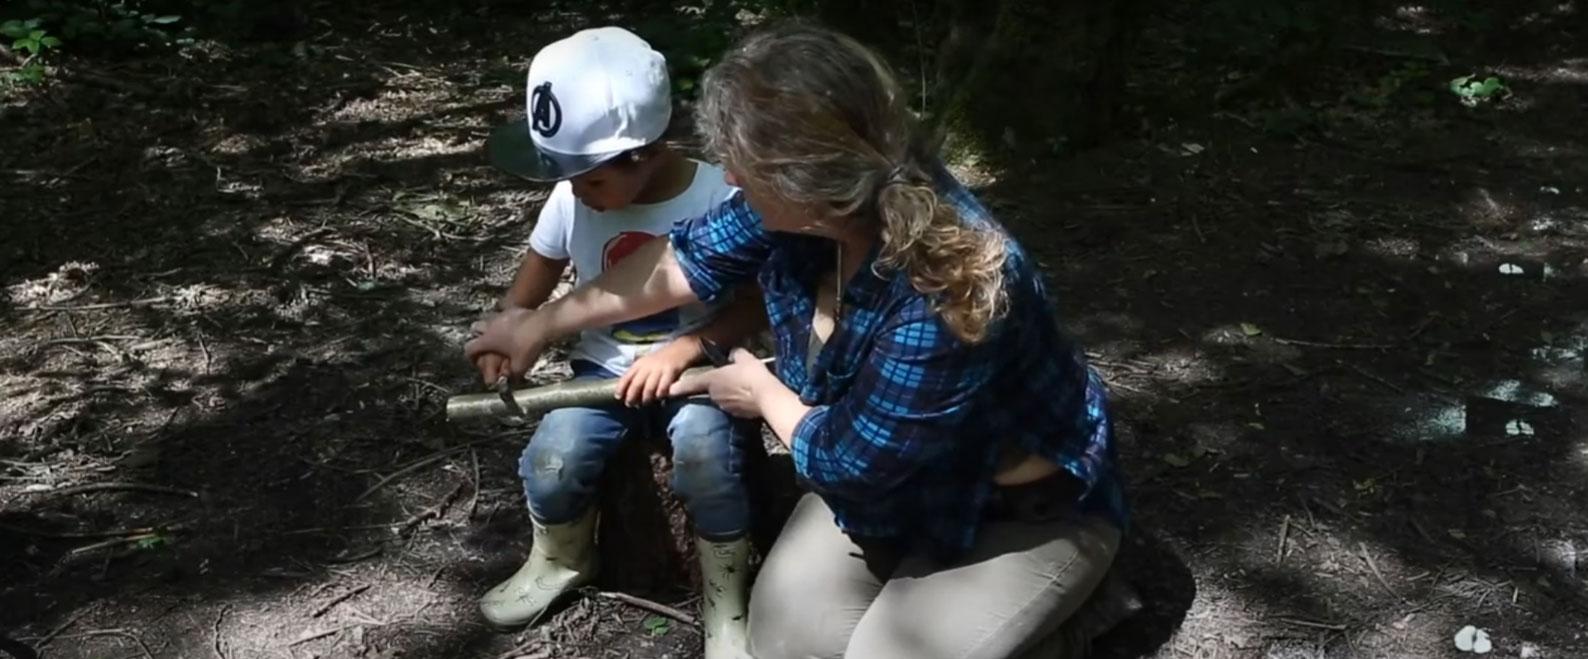 Family Outdoor Activities Tool Skills